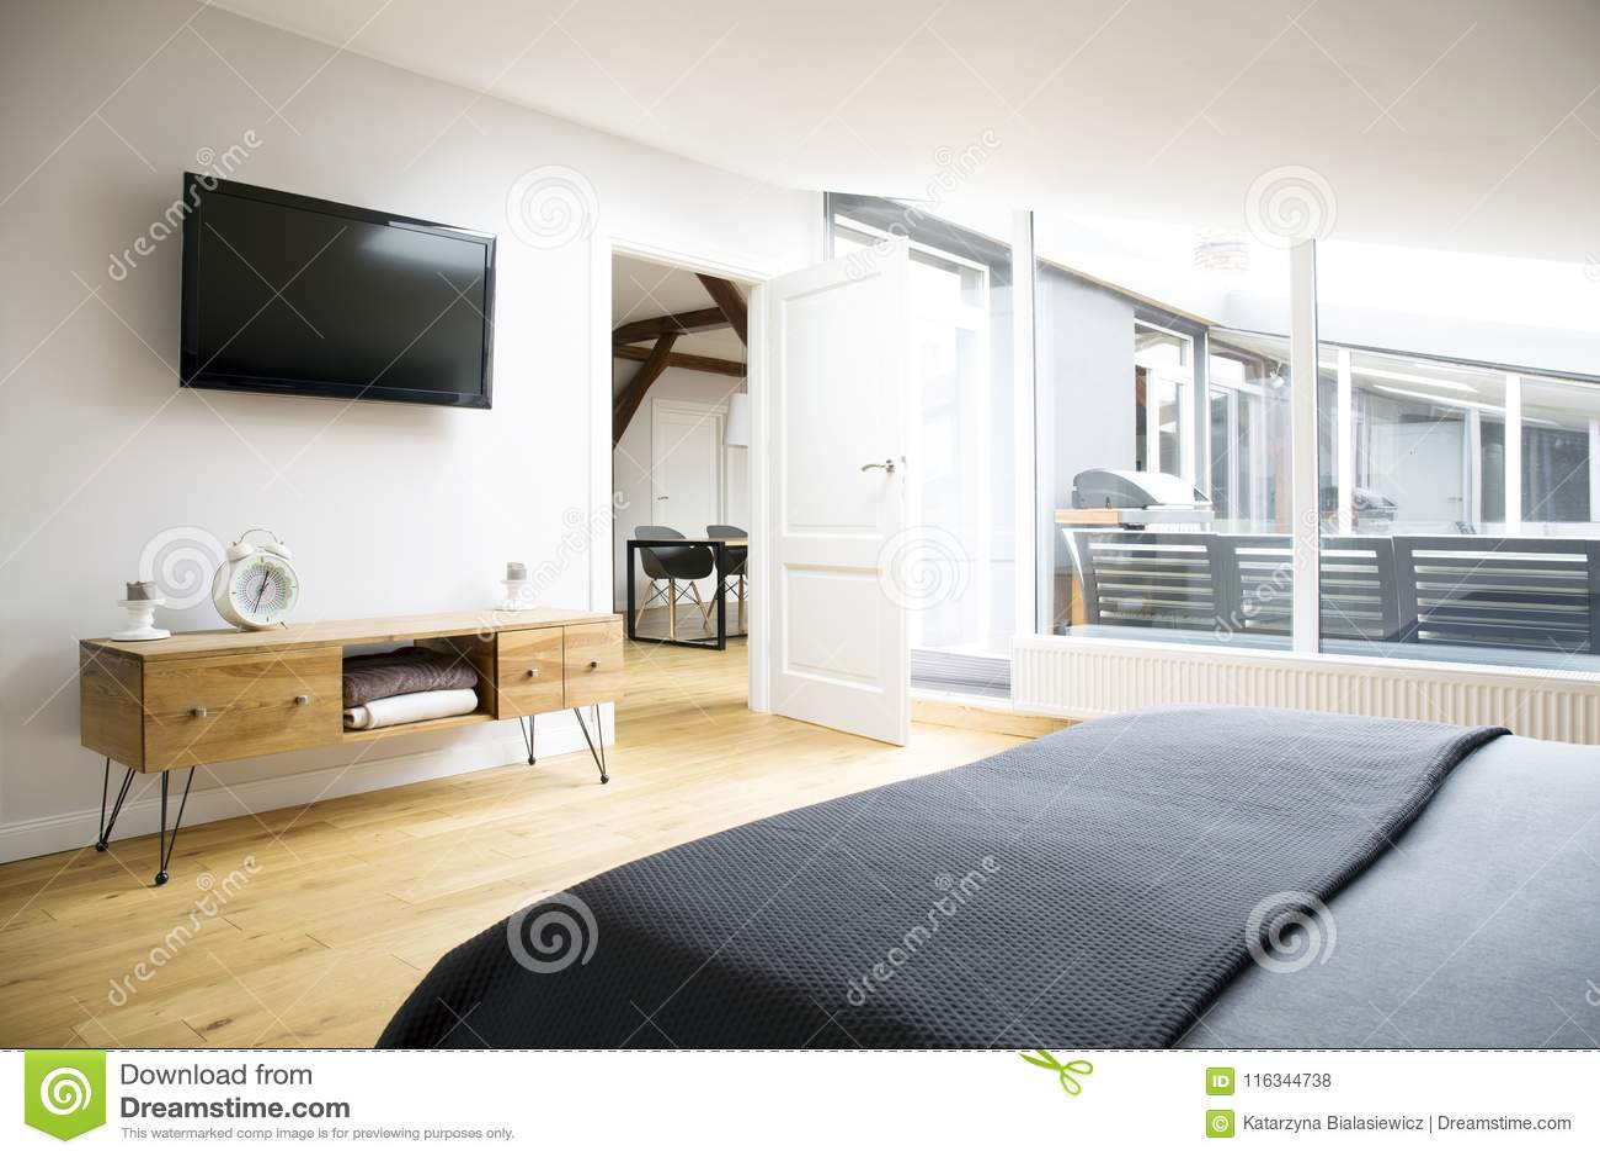 ТВ и шкаф в квартире